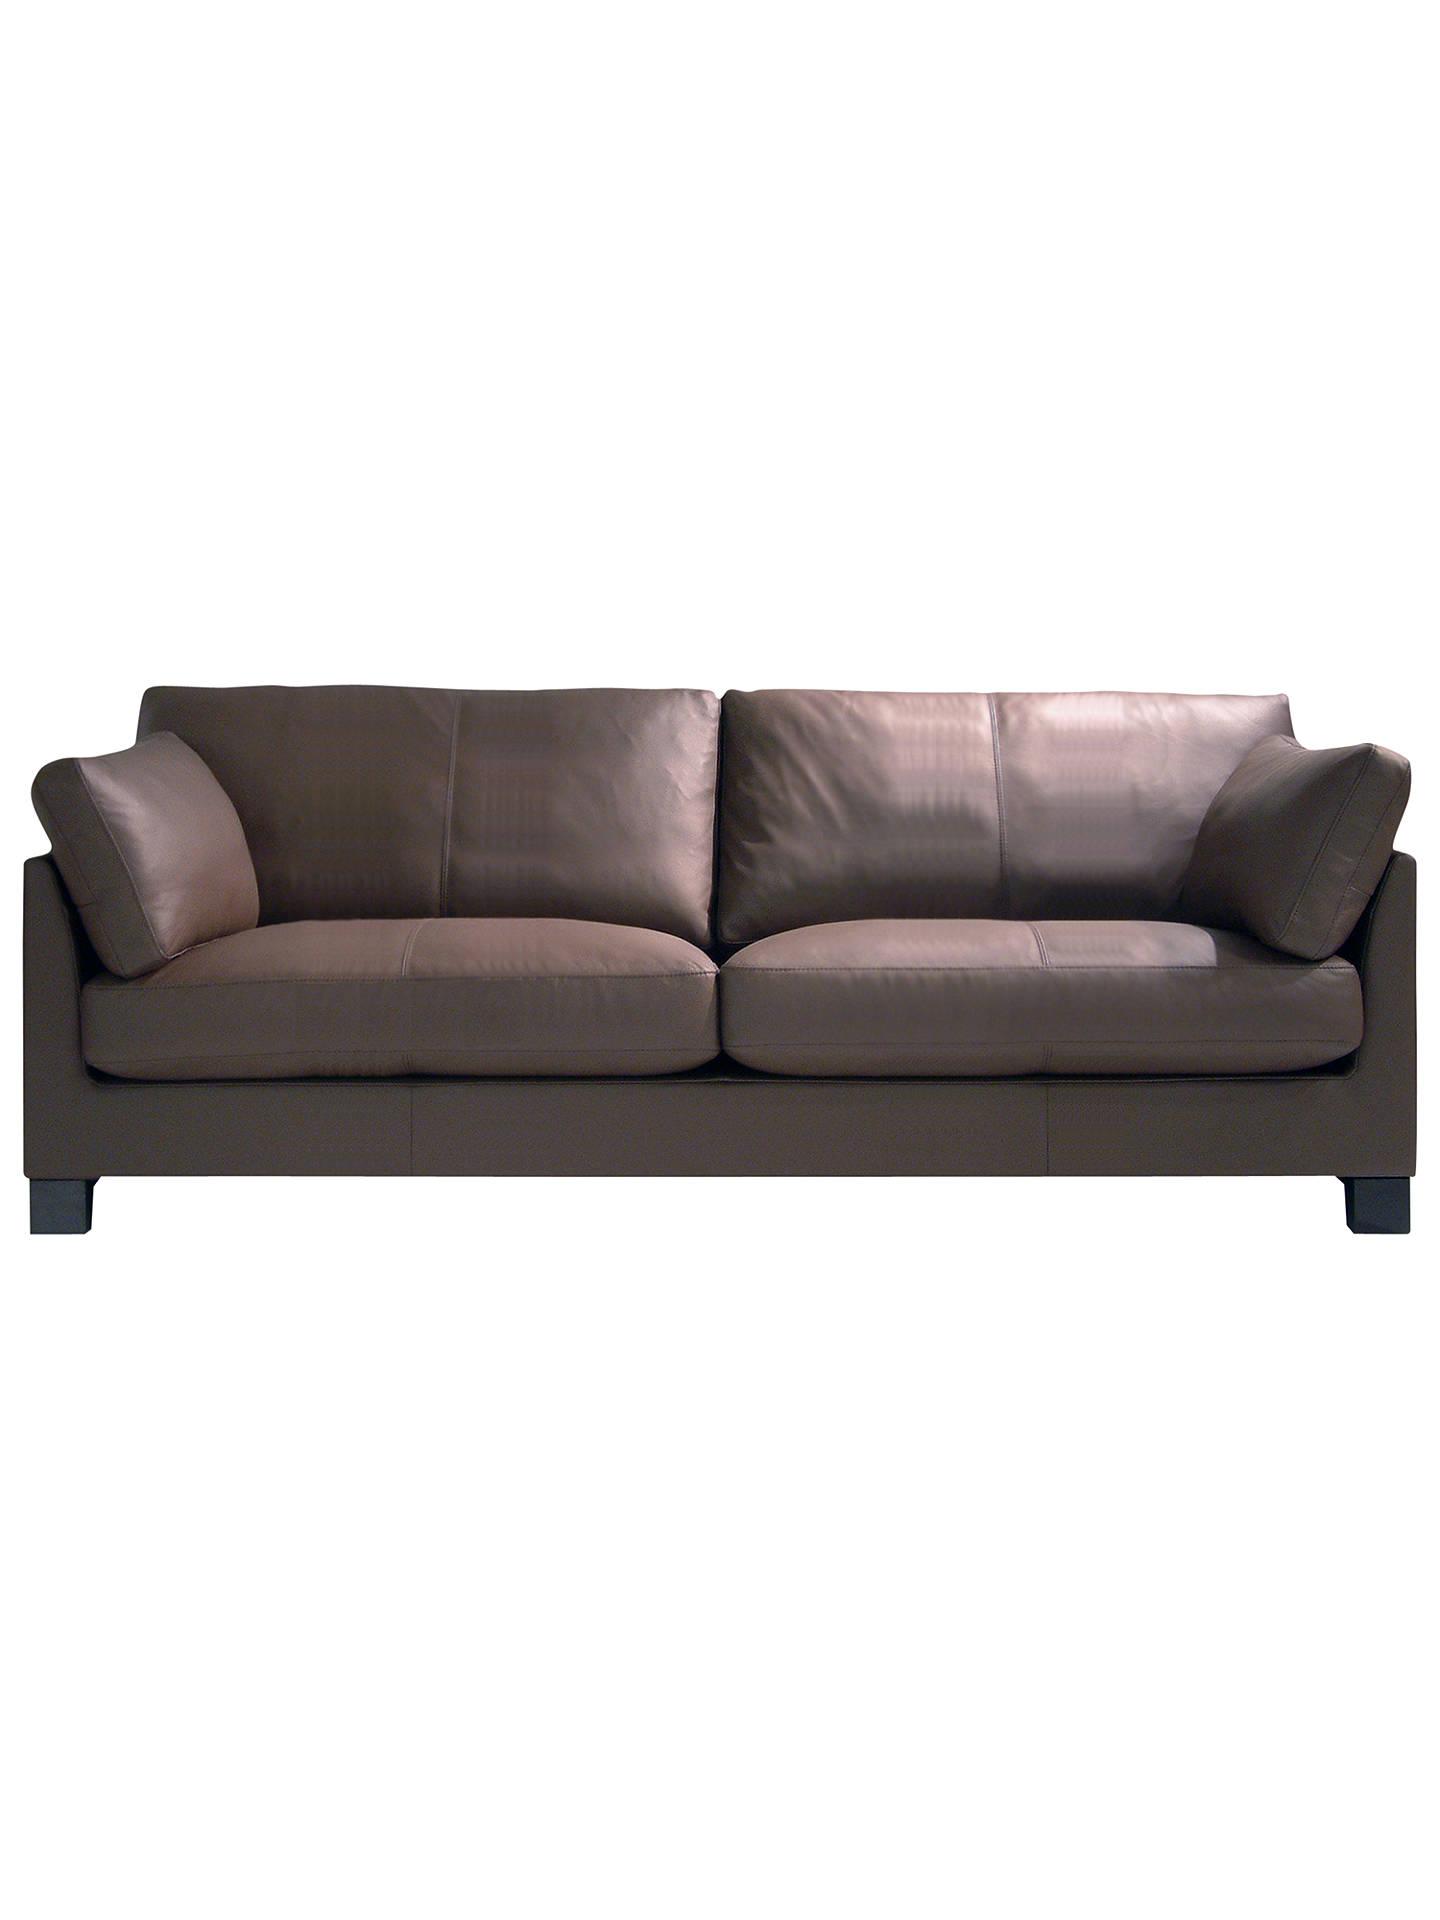 BuyJohn Lewis Ikon Leather Grand 4 Seater Sofa, Mocha Dakota Leather Online  At Johnlewis.